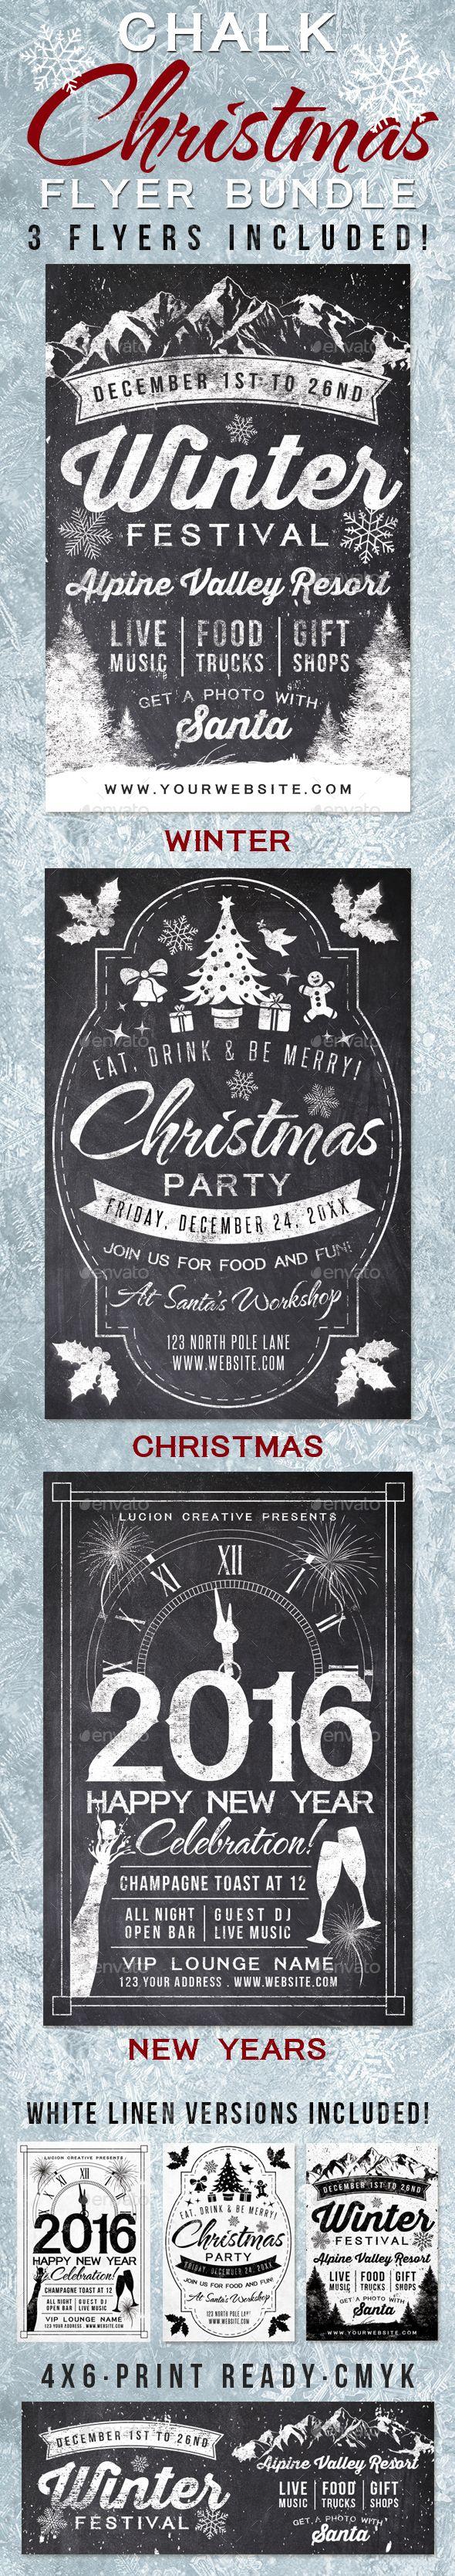 Chalk Christmas Flyer Templates PSD Bundle #design Download: http://graphicriver.net/item/chalk-christmas-flyer-bundle/13570179?ref=ksioks